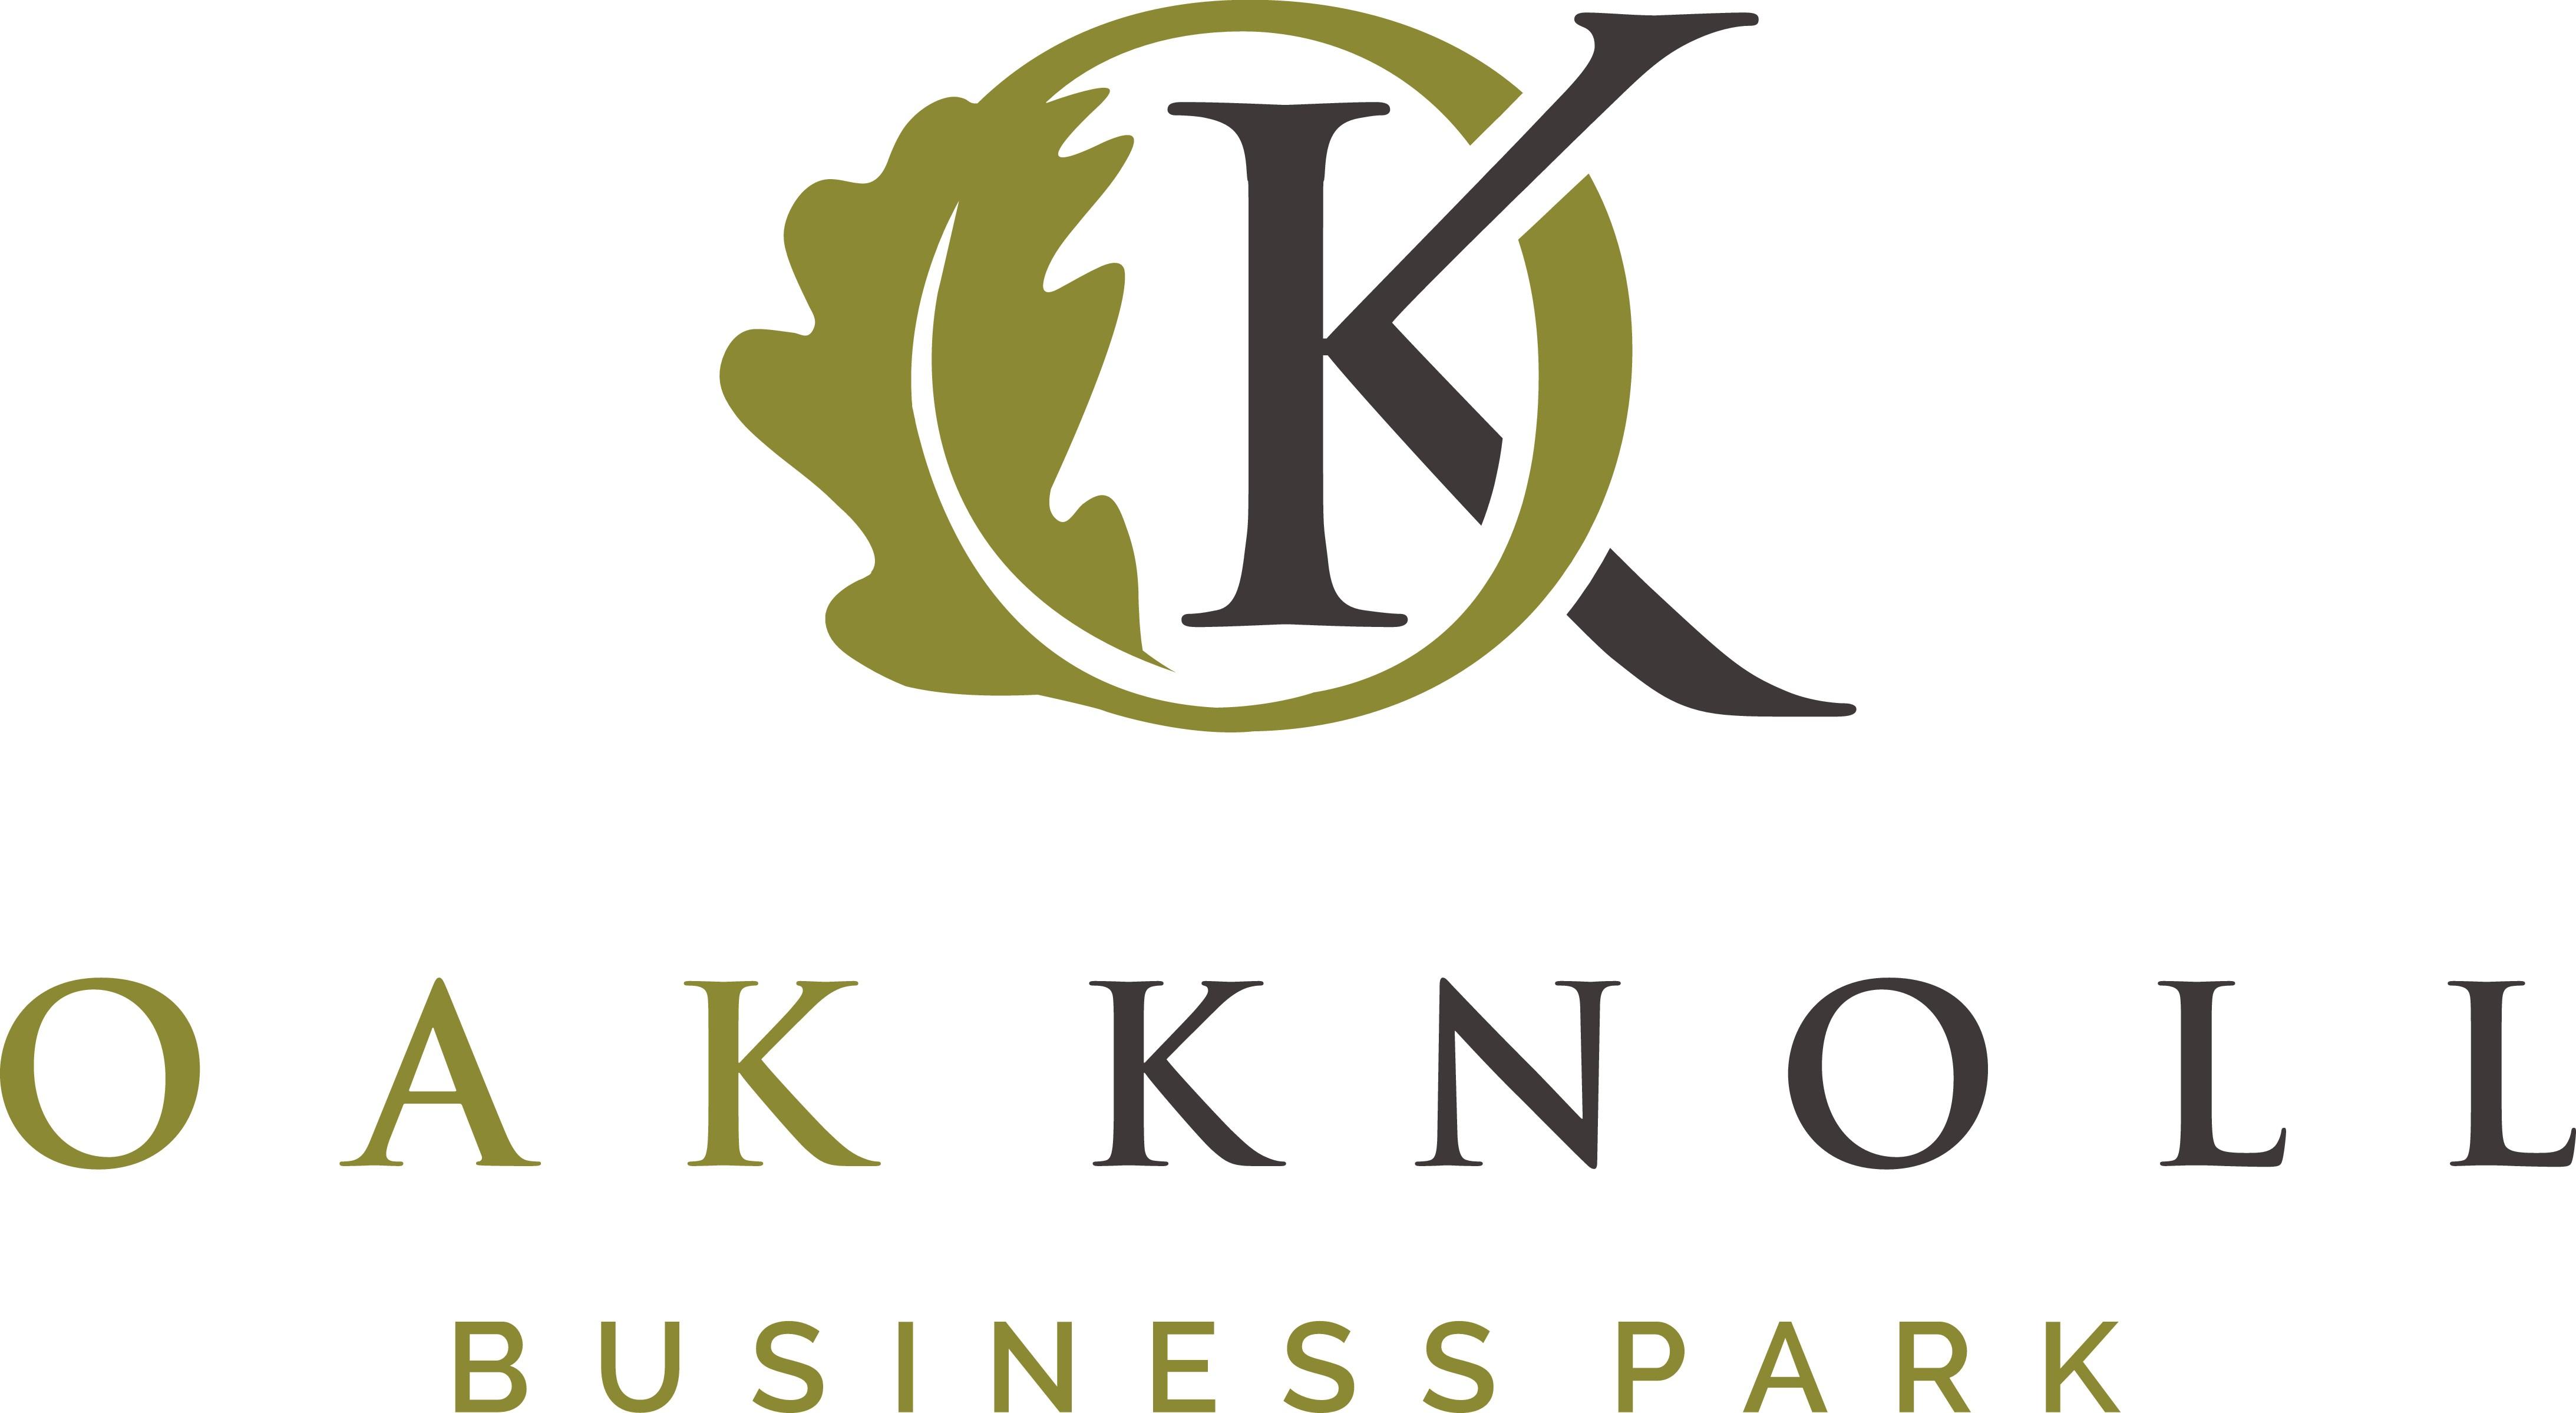 Create a logo for Oak Knoll Business Park